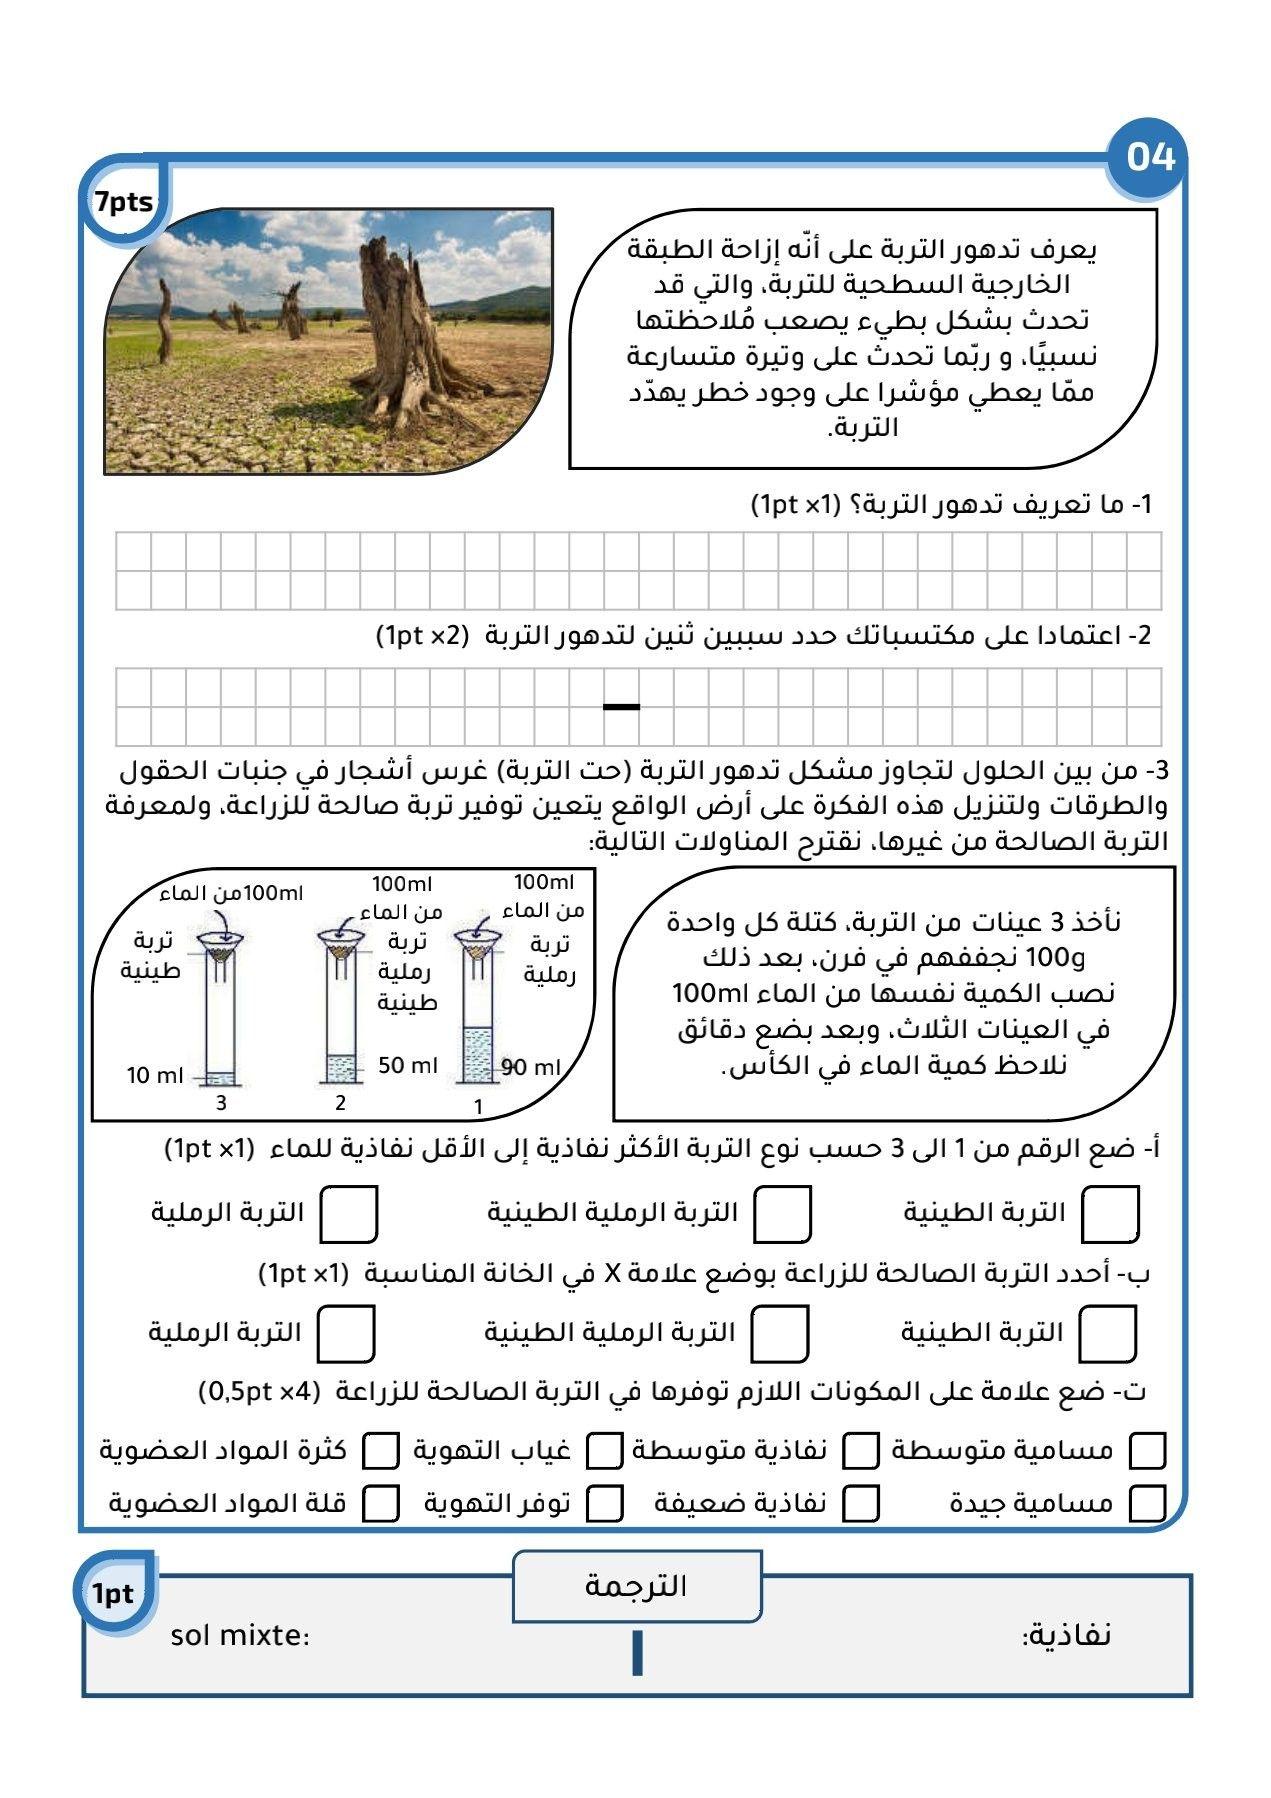 Pin By Amal Hayati On النشاط العلمي الخامس In 2021 Sailing Word Search Puzzle Words